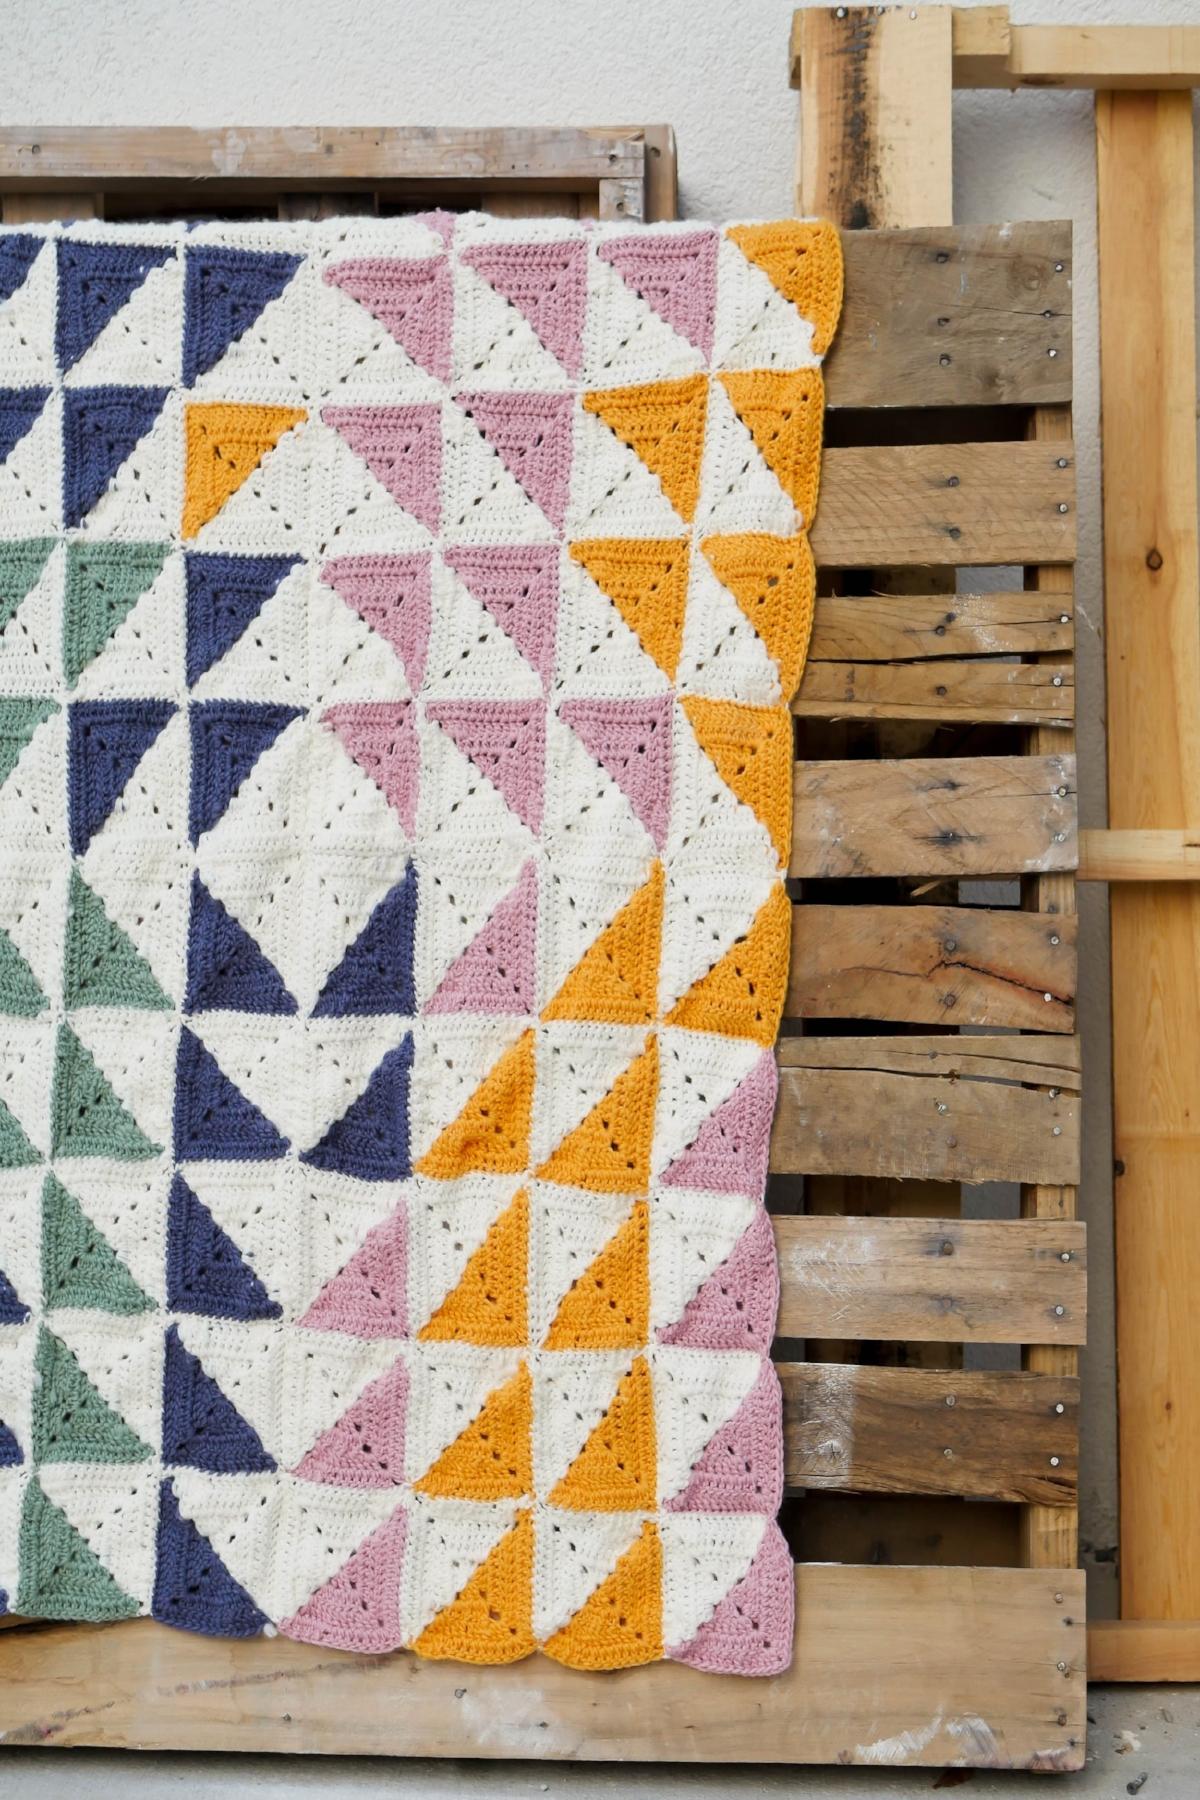 Kaleidoscope Blanket by Sewrella